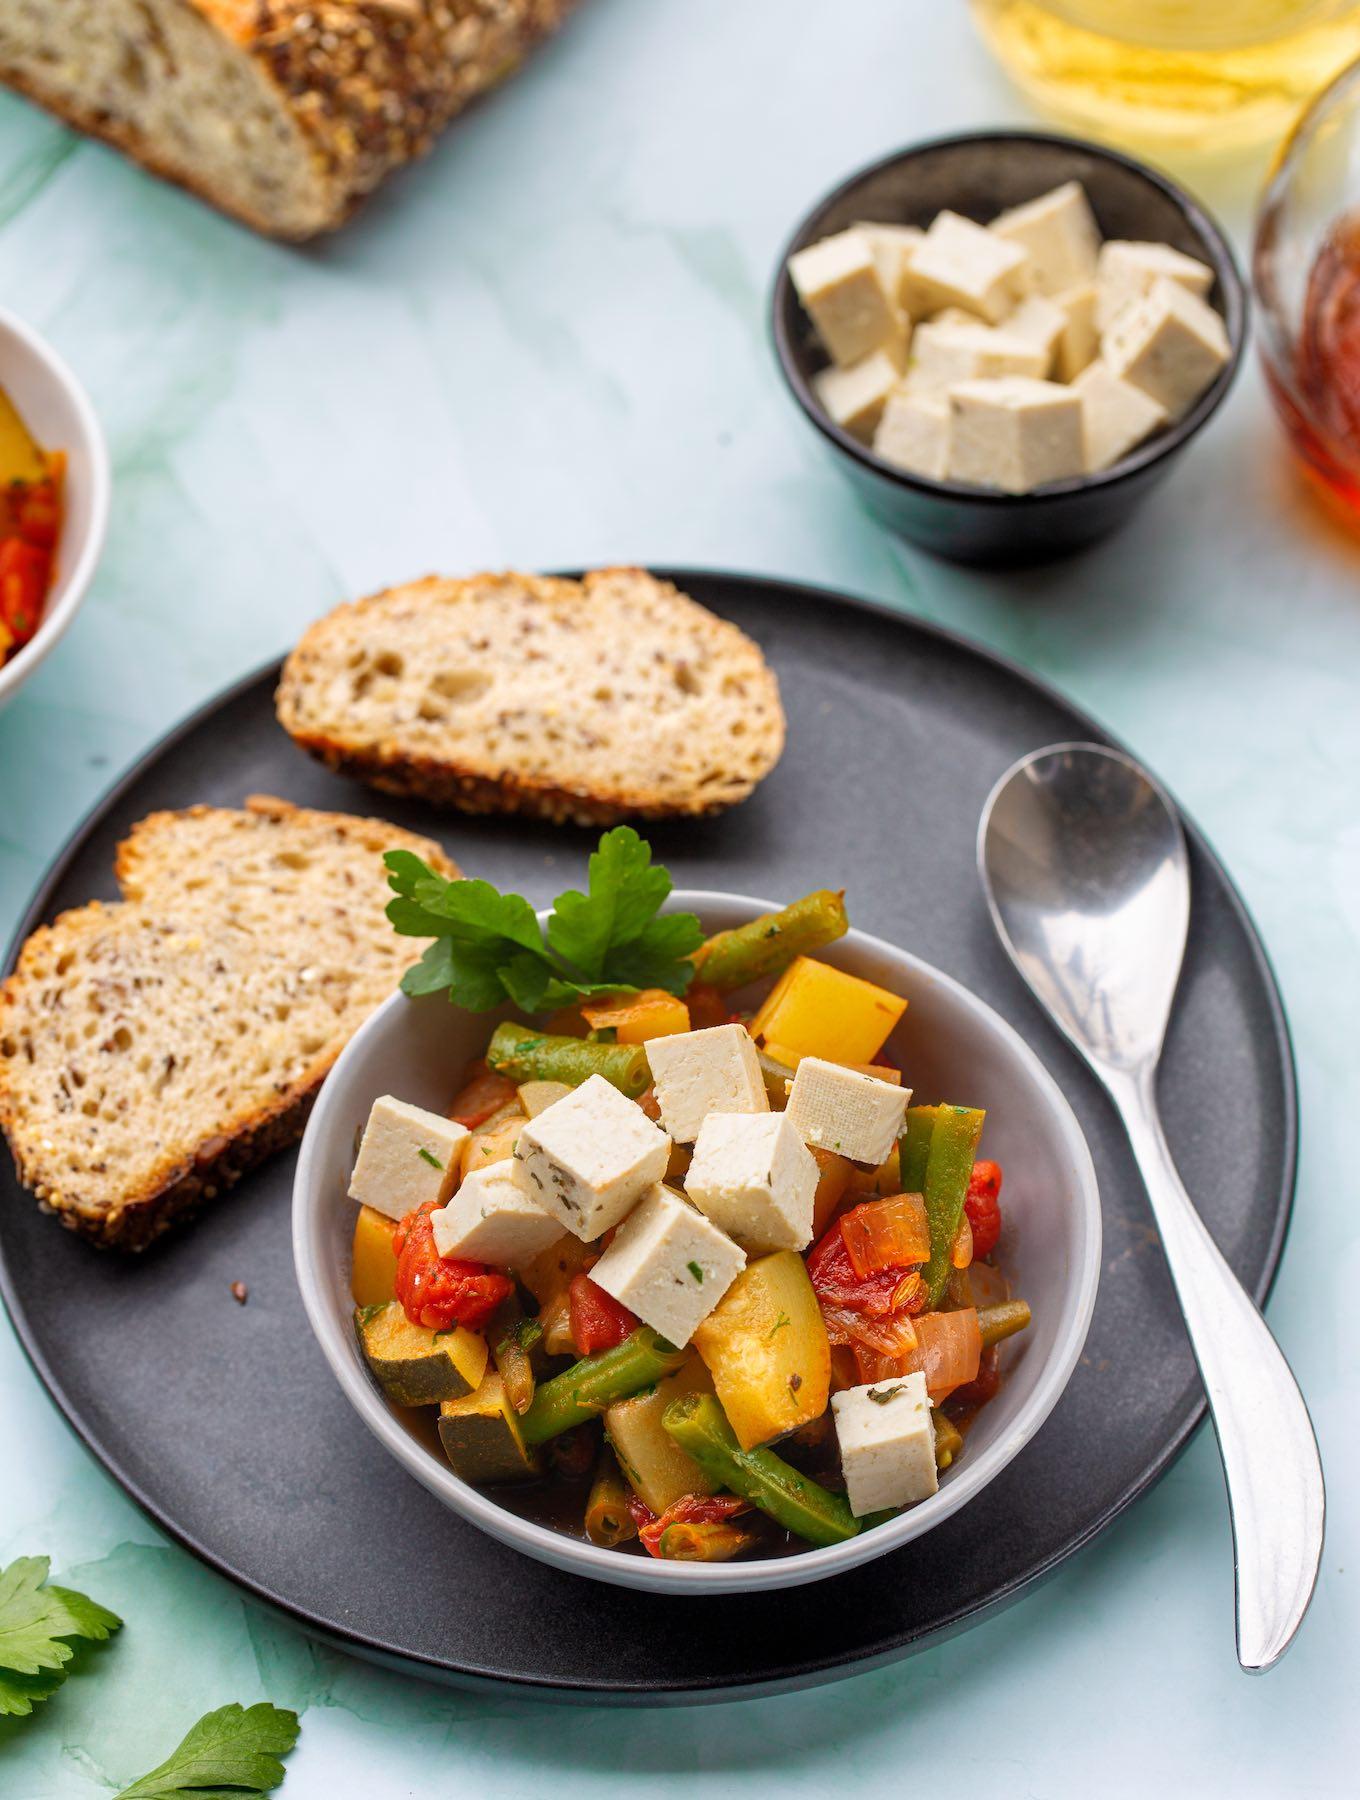 Greek vegetable stew with tofu feta